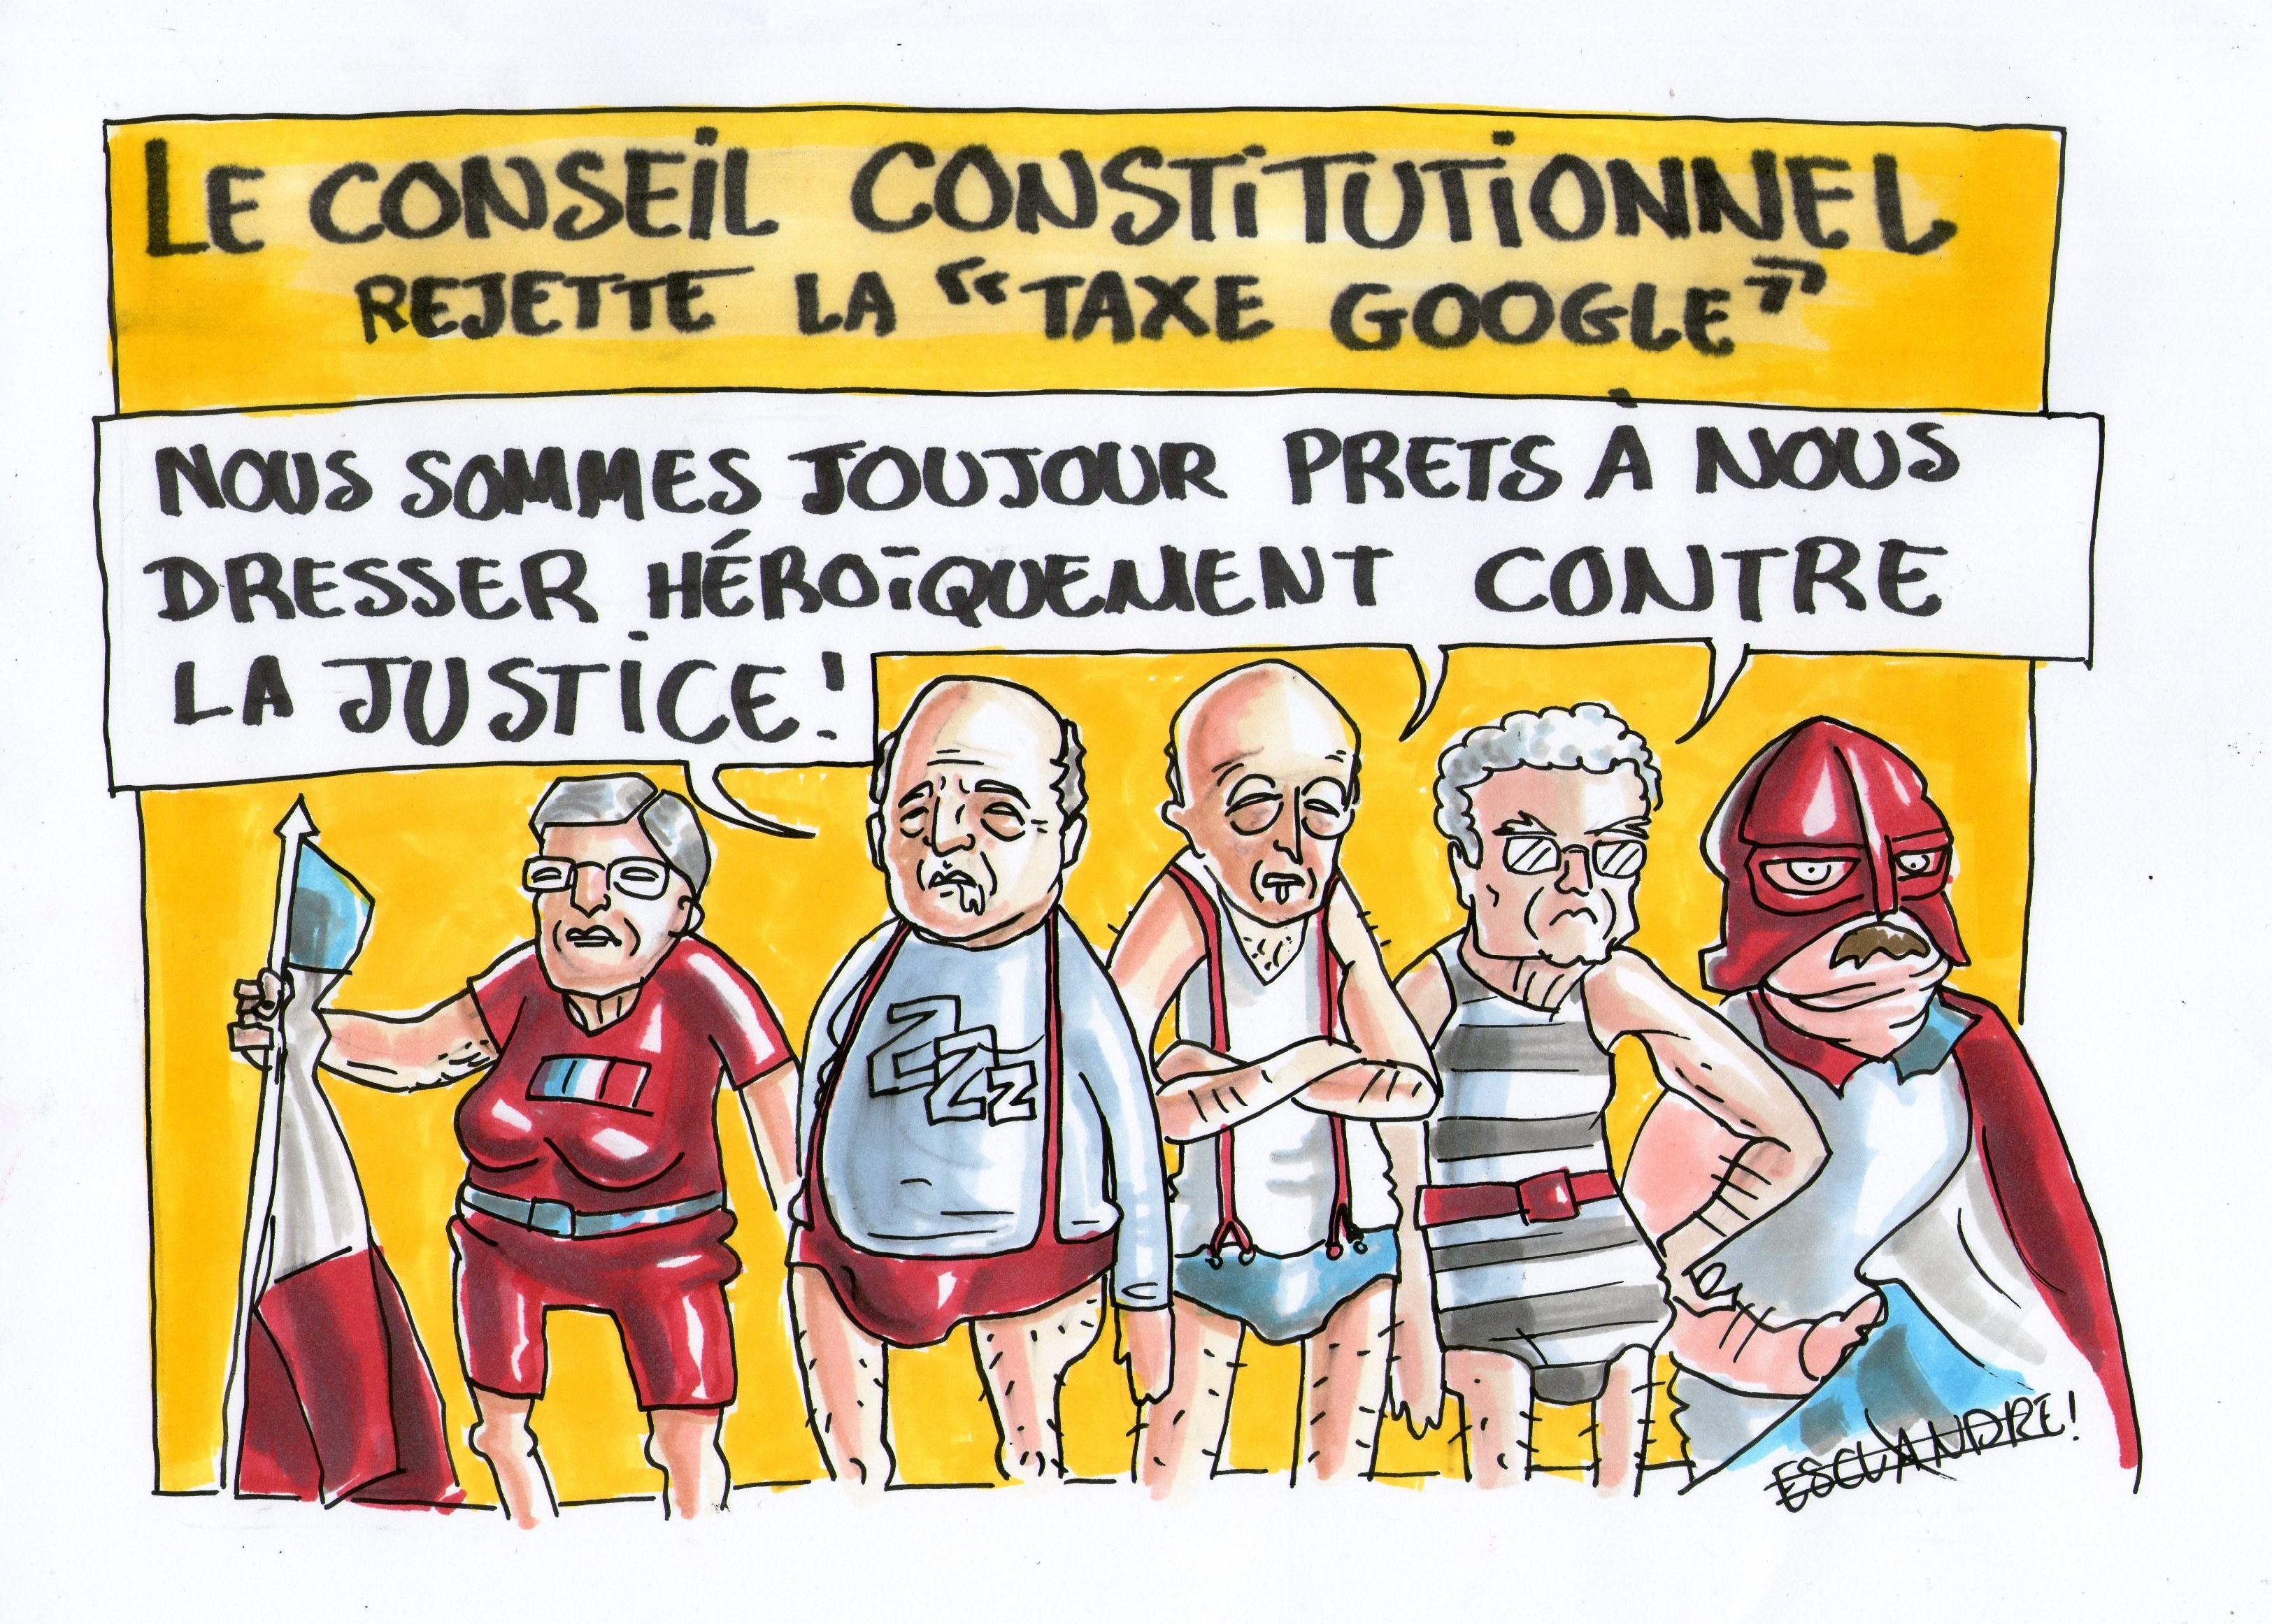 Le conseil constitutionnel rejette la «taxe Google»